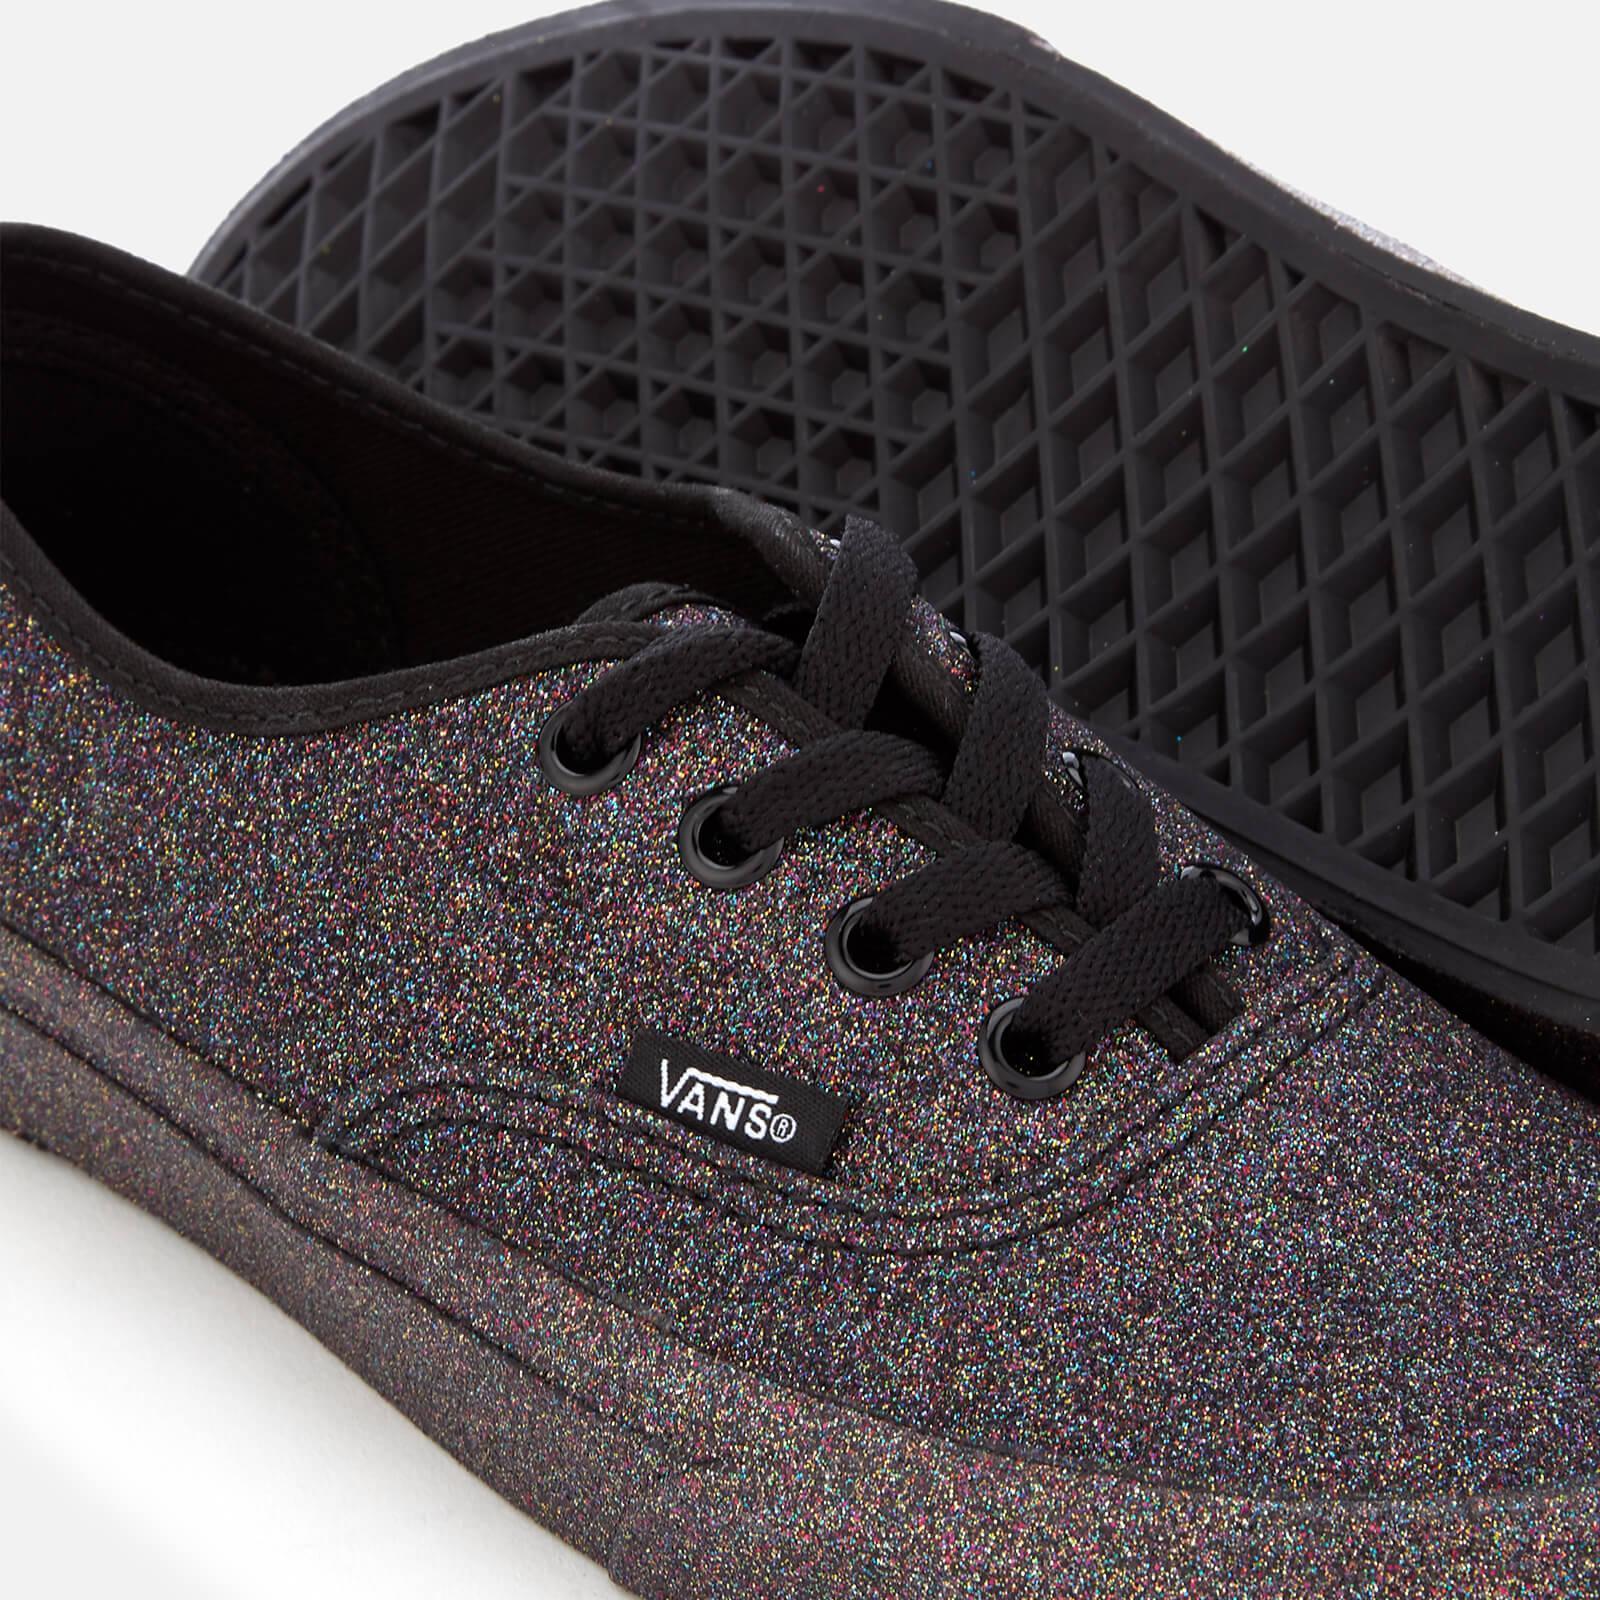 Lyst - Vans Women s Rainbow Glitter Authentic Trainers in Black 0d0ea6500